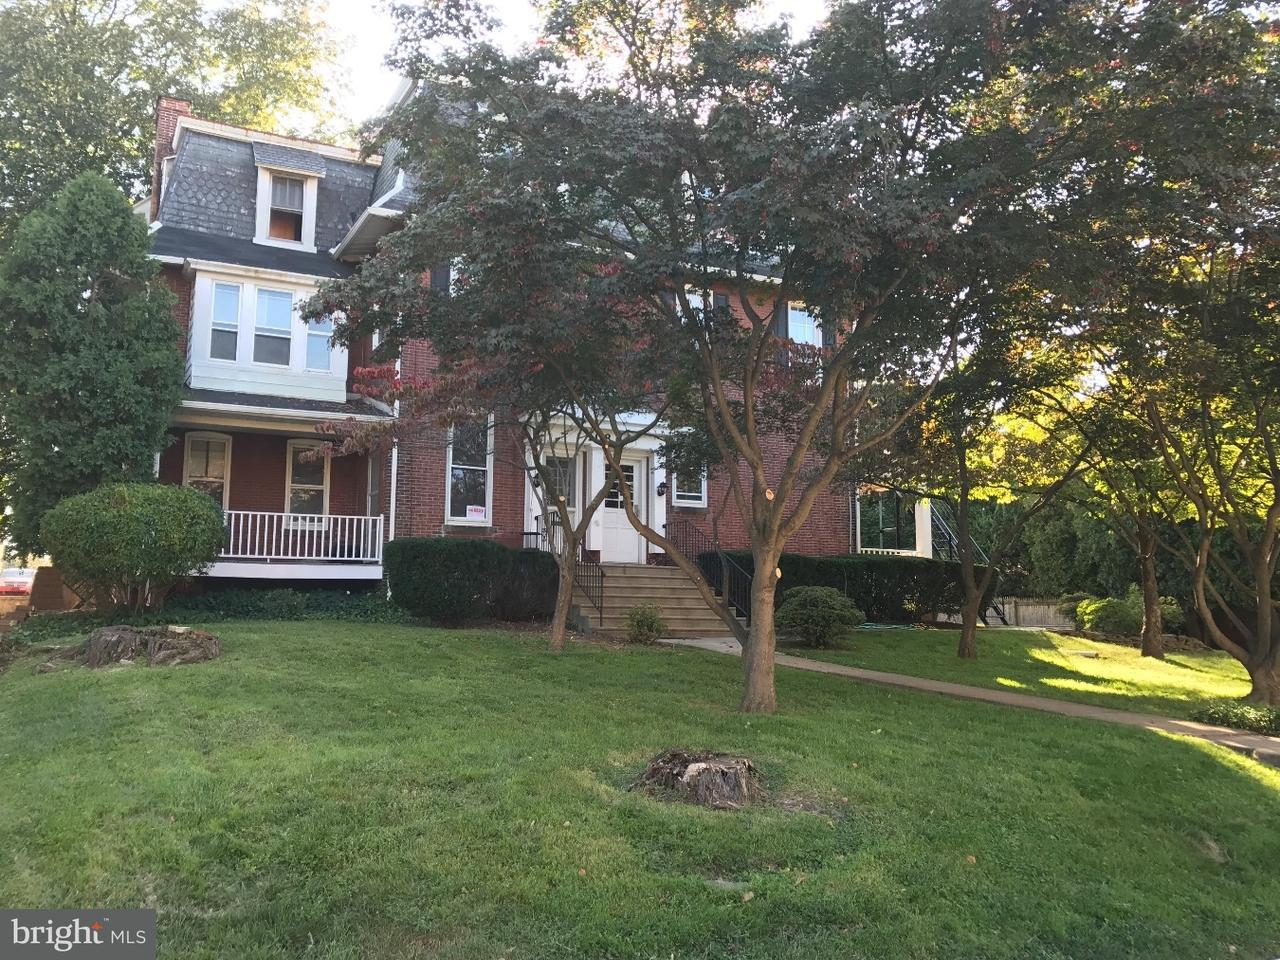 Casa Unifamiliar por un Alquiler en 108 MORTON AVE #1 Ridley Park, Pennsylvania 19078 Estados Unidos